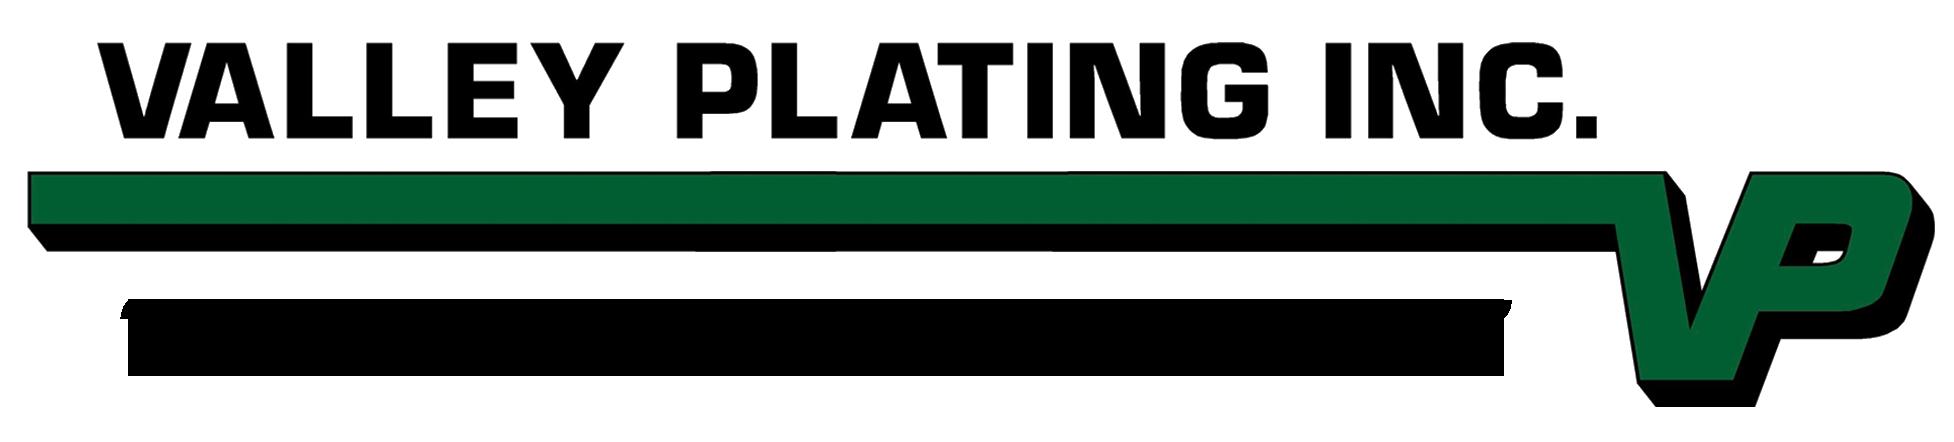 Valley-Plating-Logo-Green